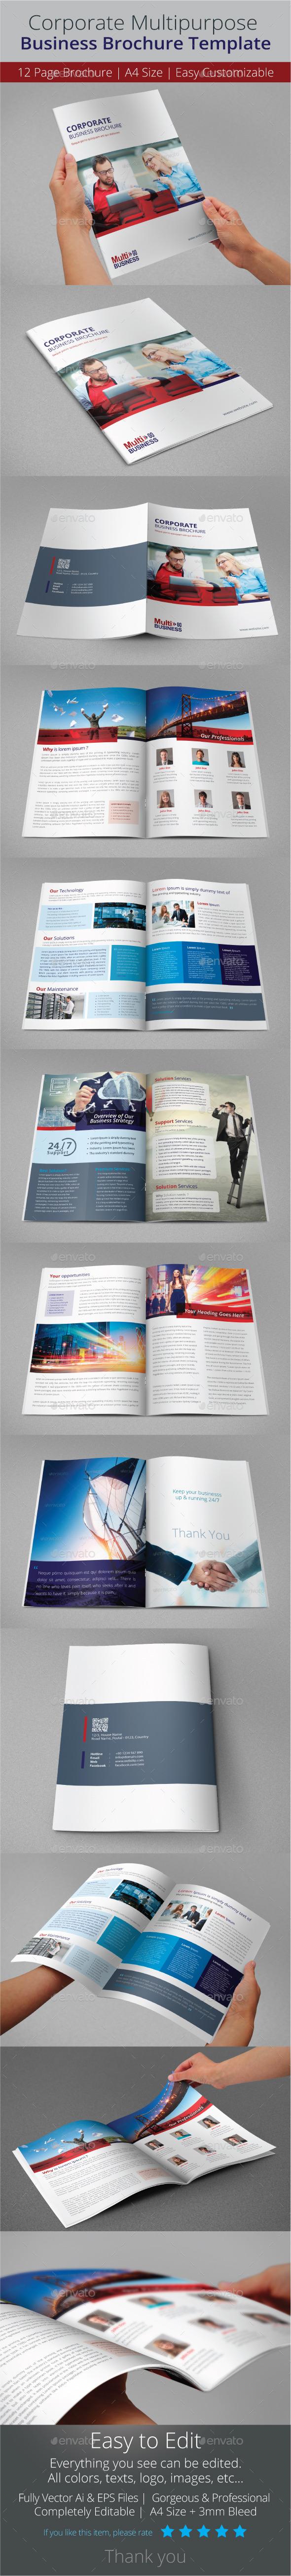 GraphicRiver Corporate Multipurpose Business Brochure Template 9693190